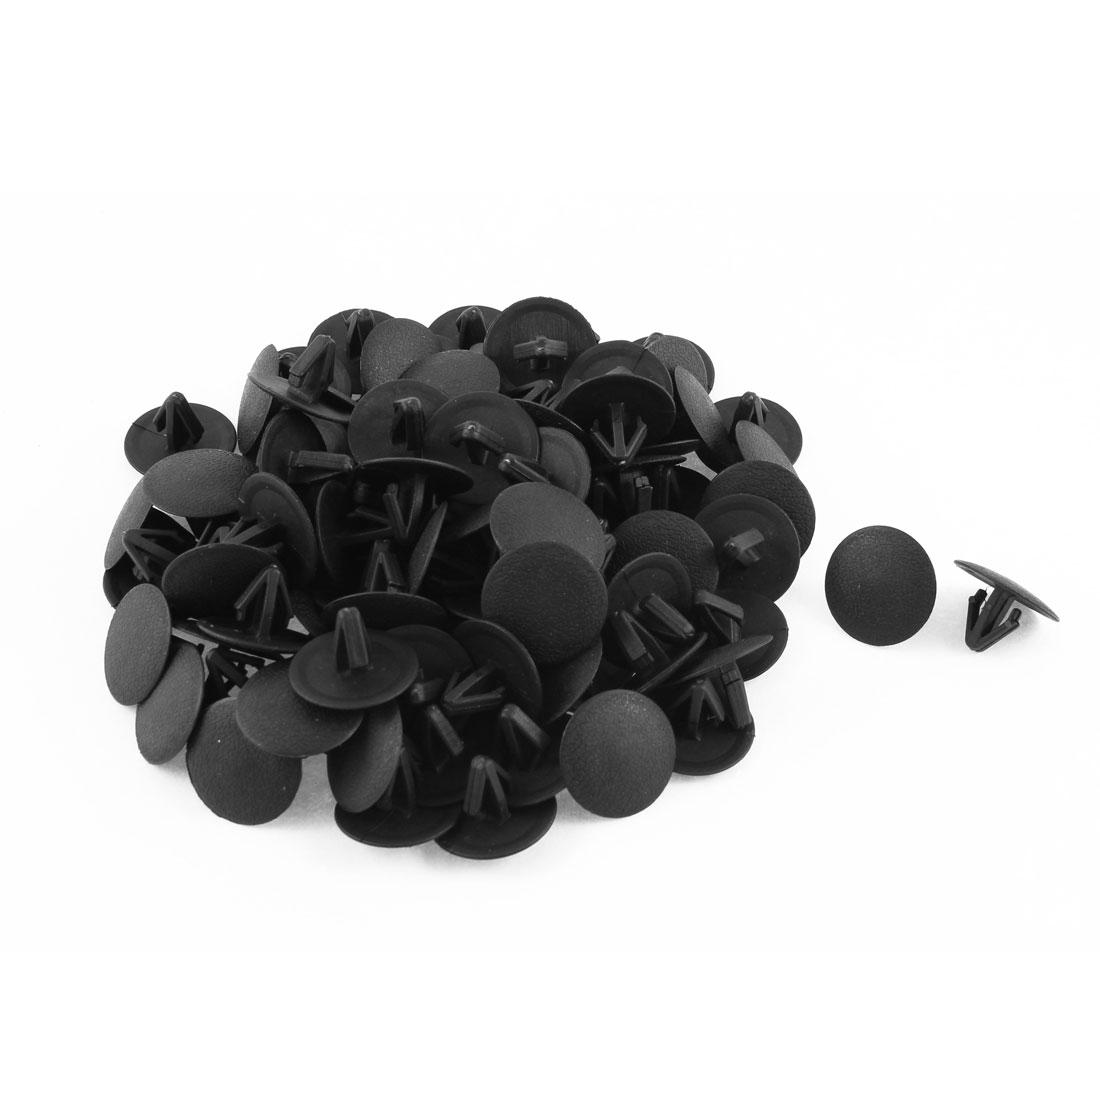 100 Pcs Black Plastic Rivet Trim Fastener Moulding Clips 11mm x 12mm x 24mm